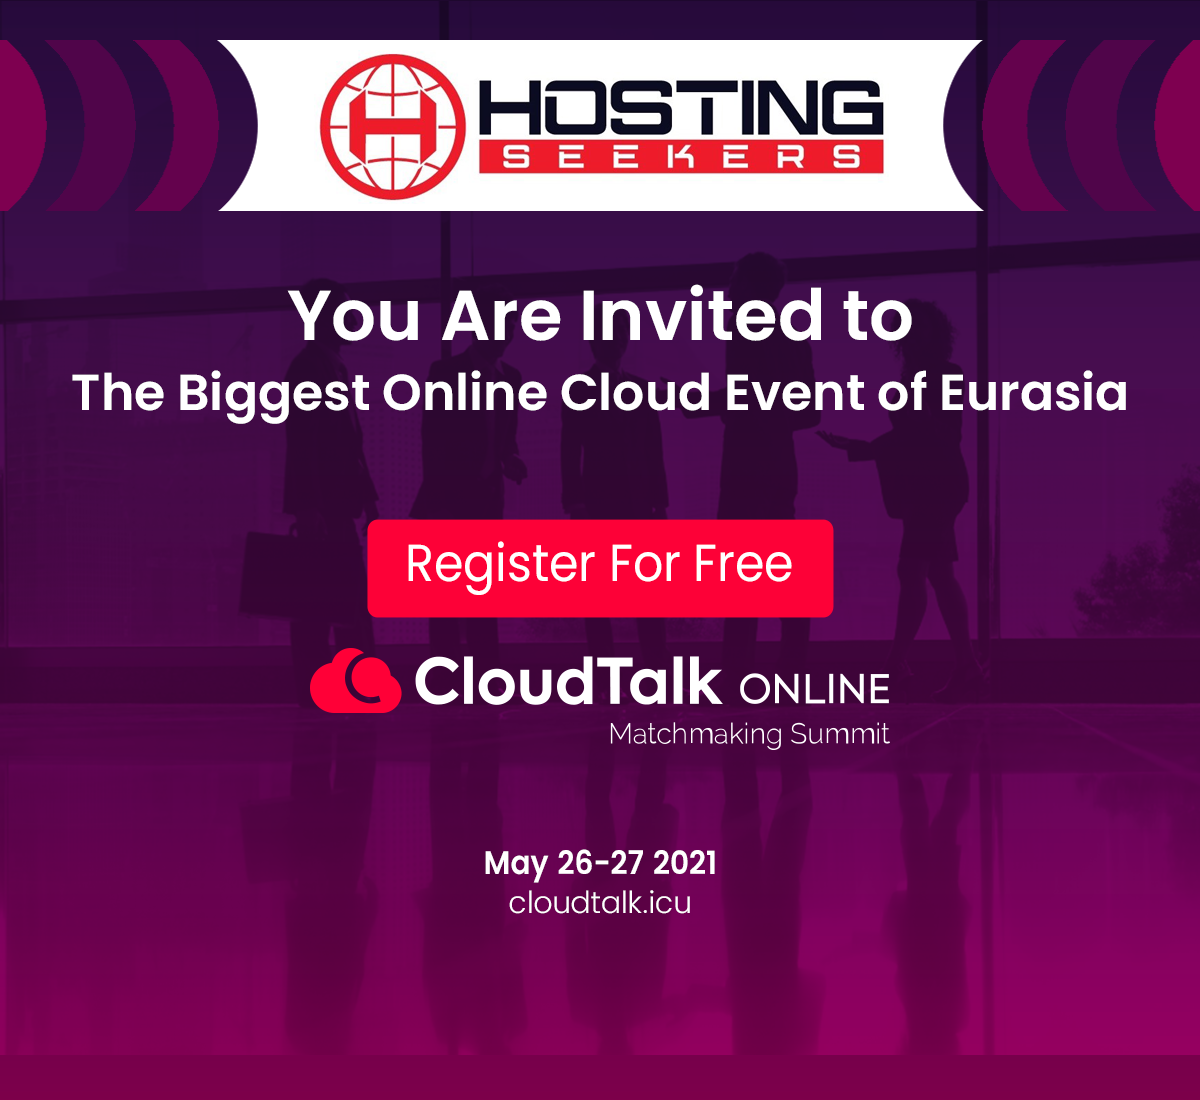 cloudtalk event